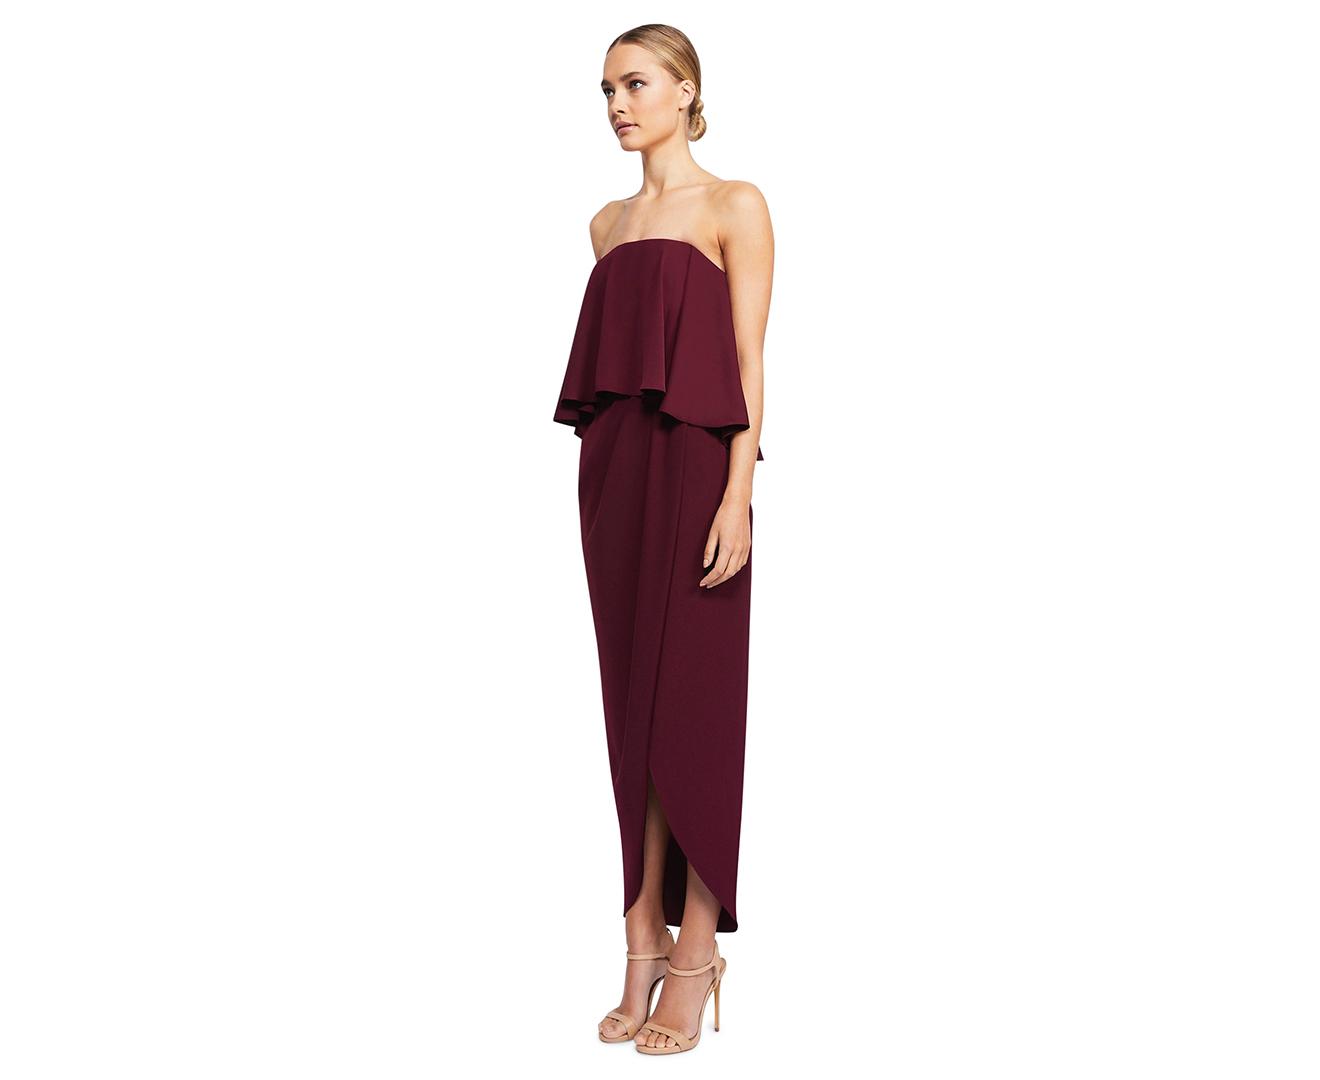 8d078197ff14 Shona Joy Women's Core Strapless Frill Dress - Aubergine | eBay